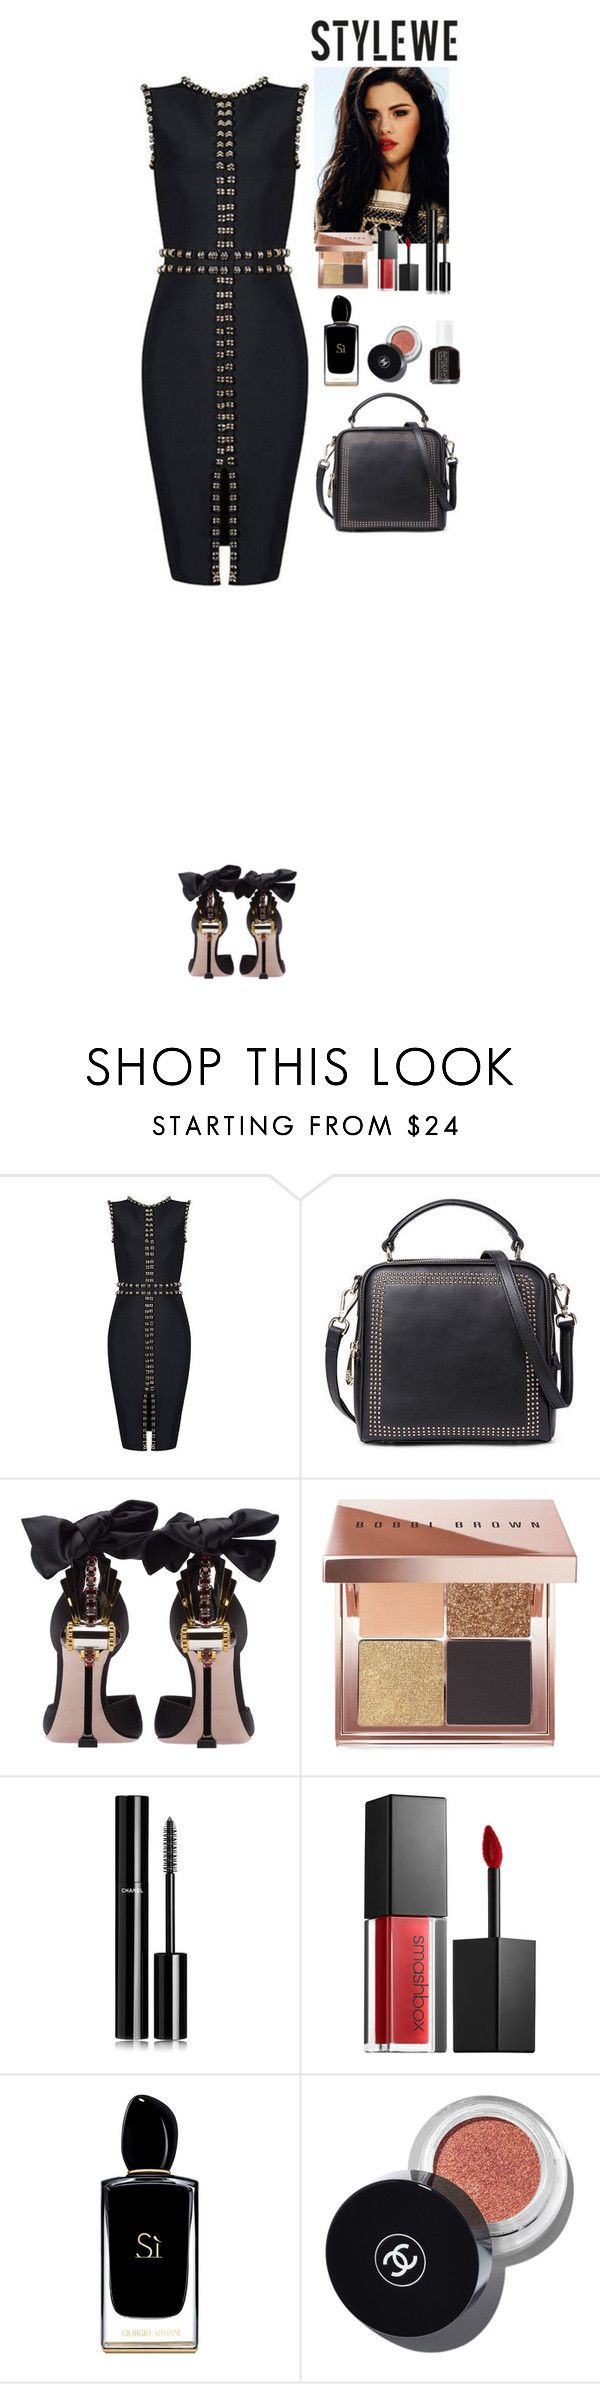 Black dress StyleWe by eliza-redkina on Polyvore featuring мода, Miu Miu, Chanel, Bobbi Brown Cosmetics, Smashbox, Giorgio Armani and Essie